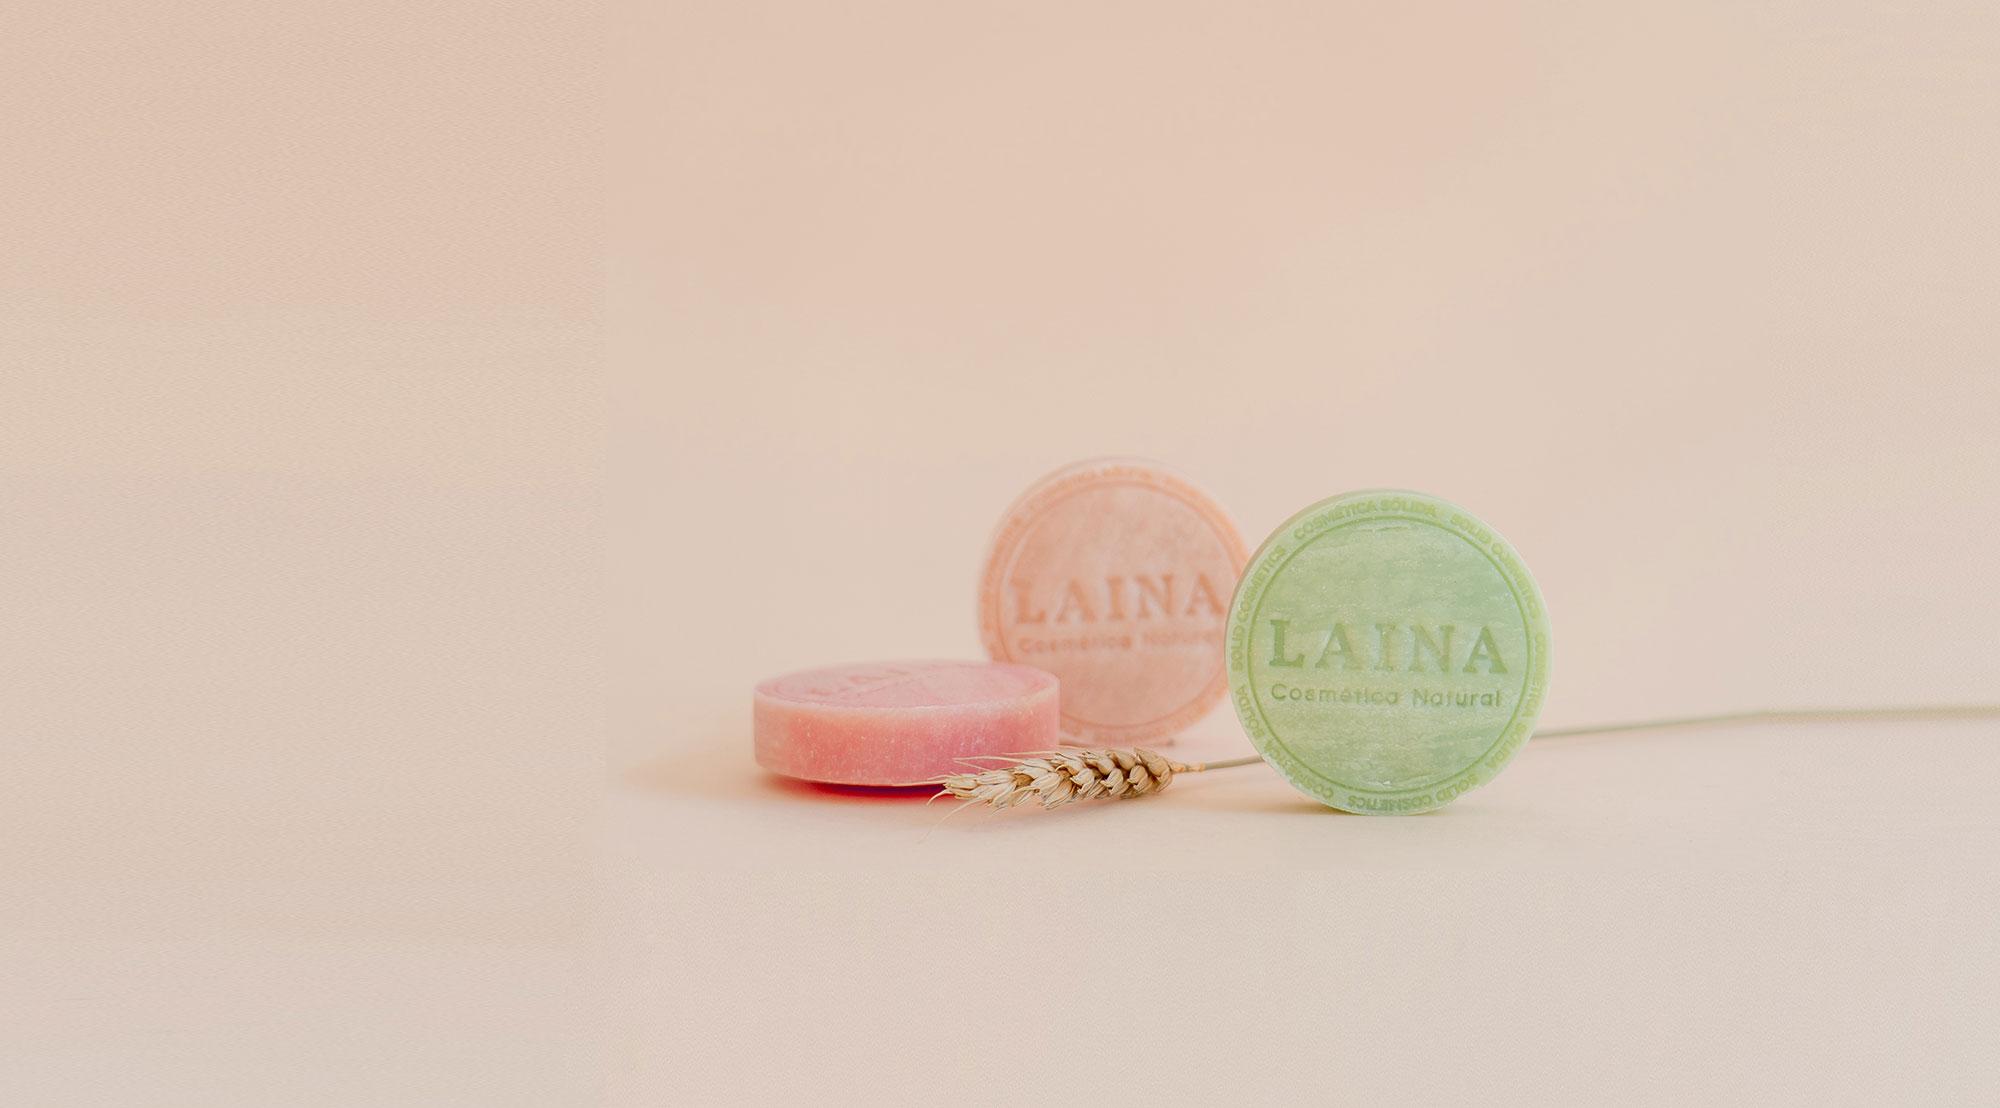 laina-cosmetics-cuidado-2b